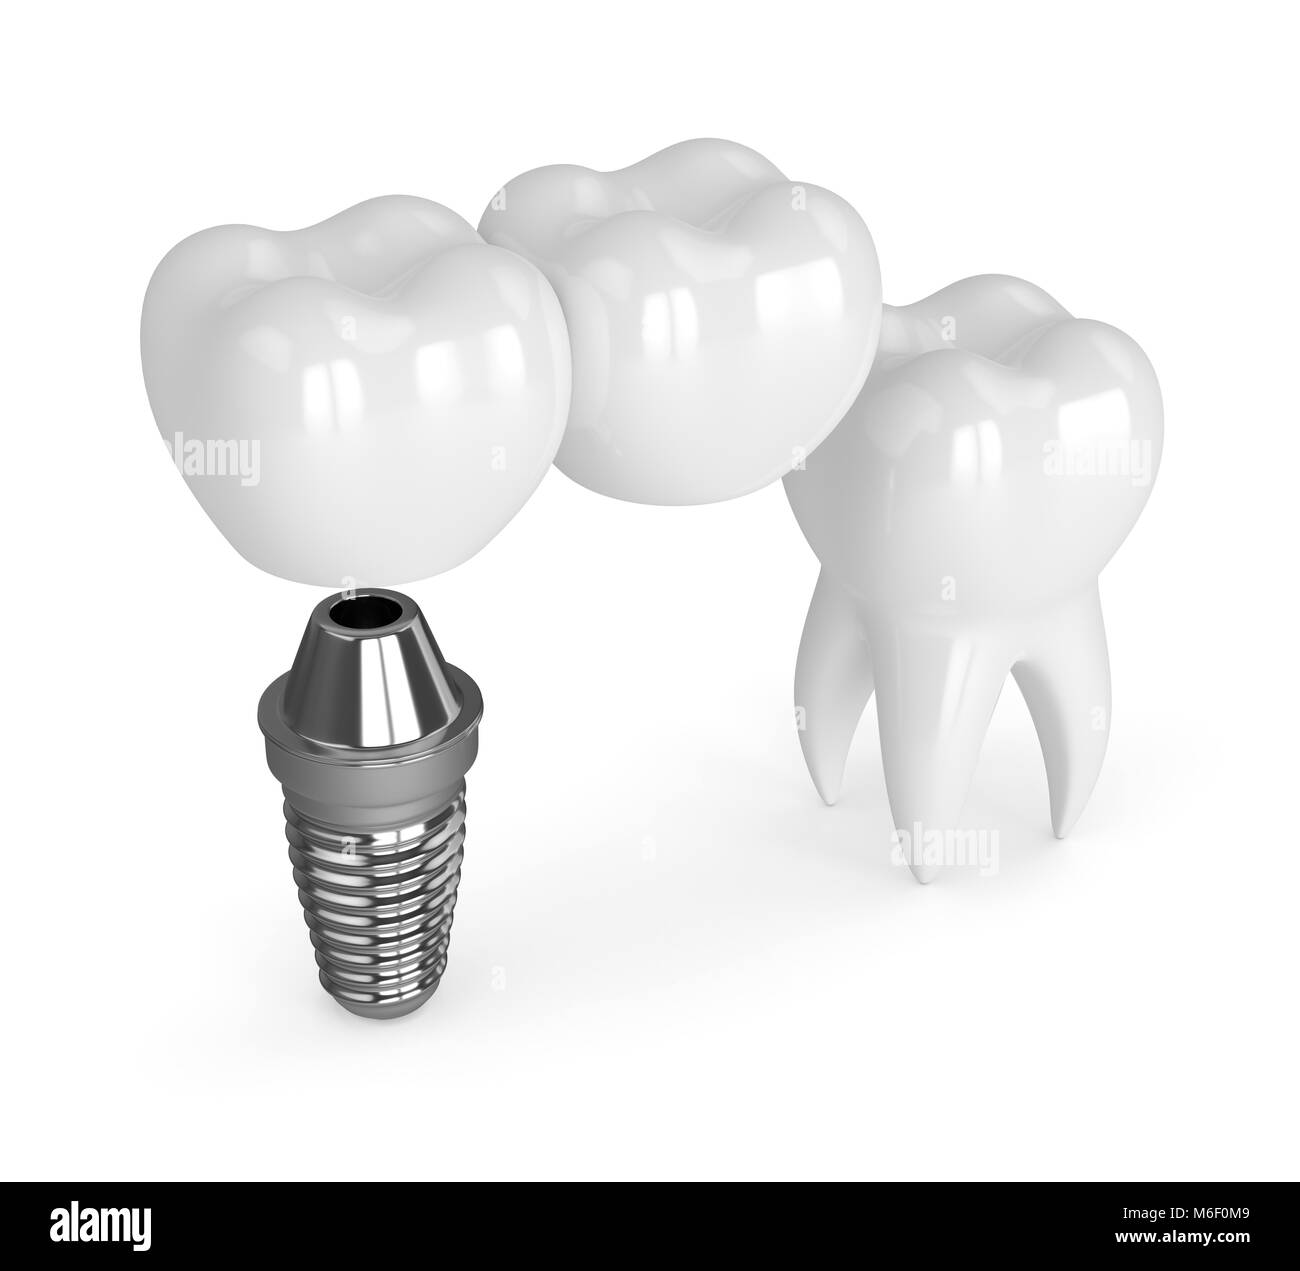 Molar Tooth Cross Section Stockfotos & Molar Tooth Cross Section ...